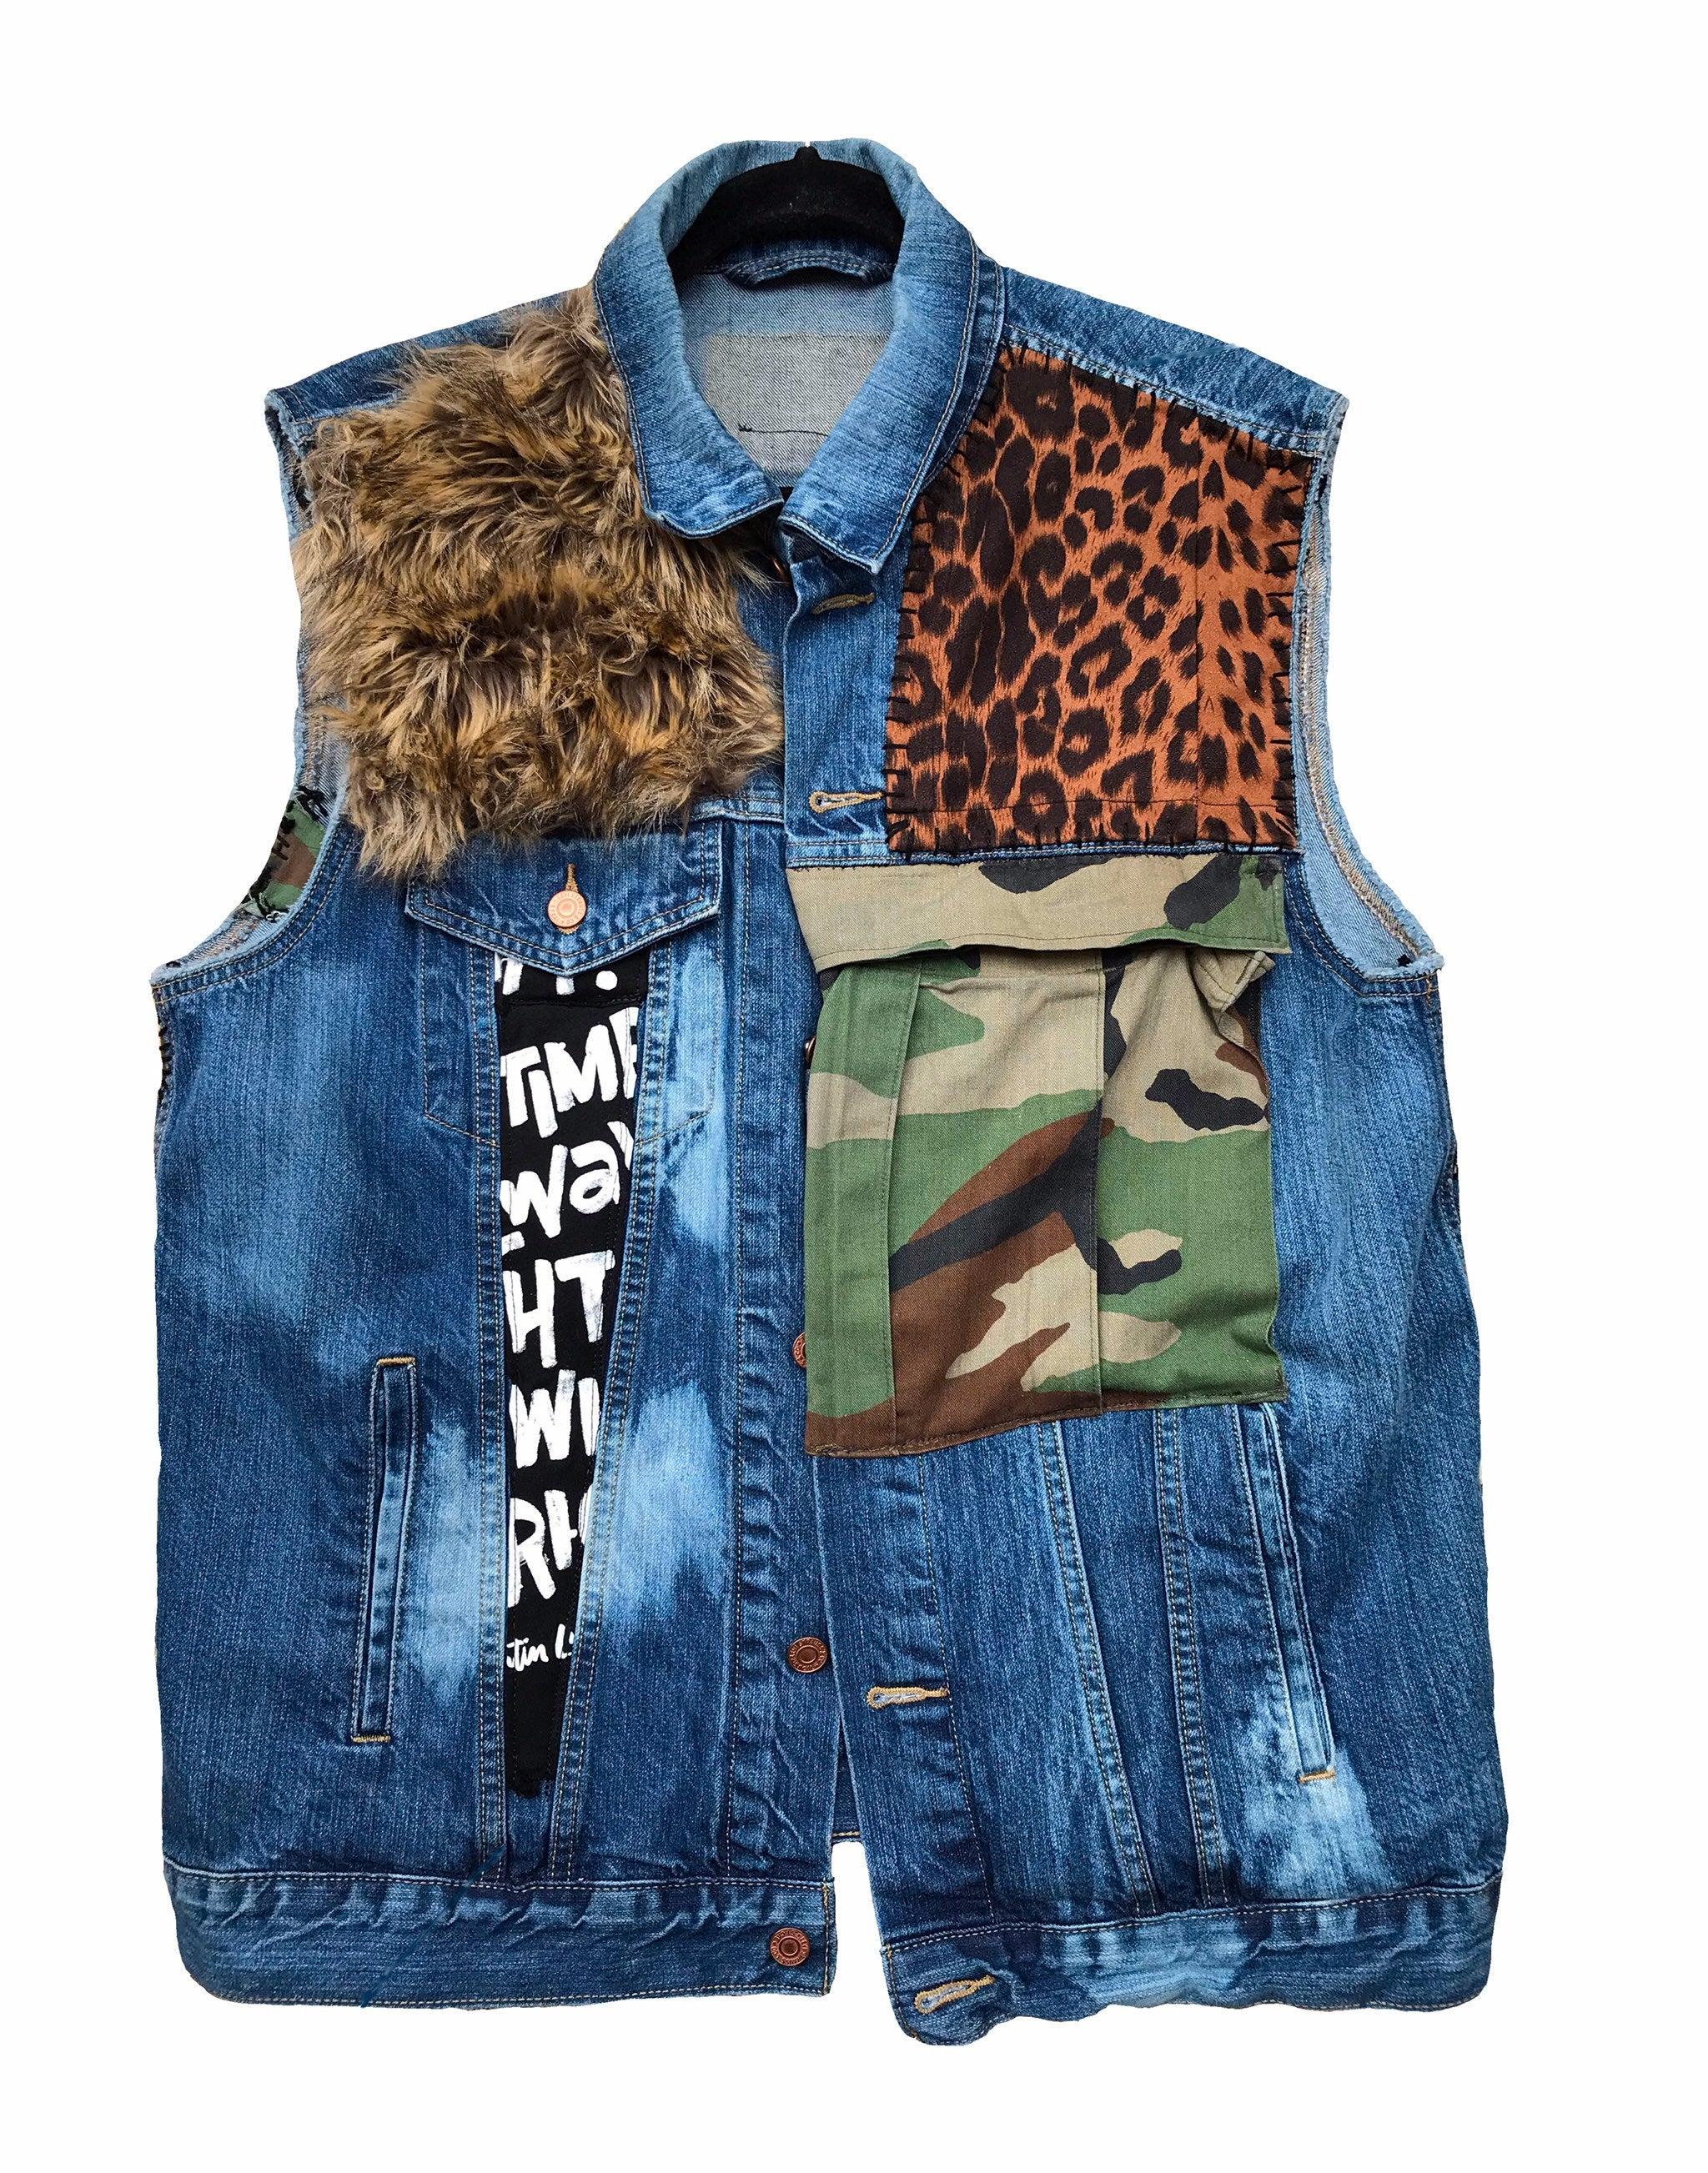 dawood_marion_jacket007.jpg